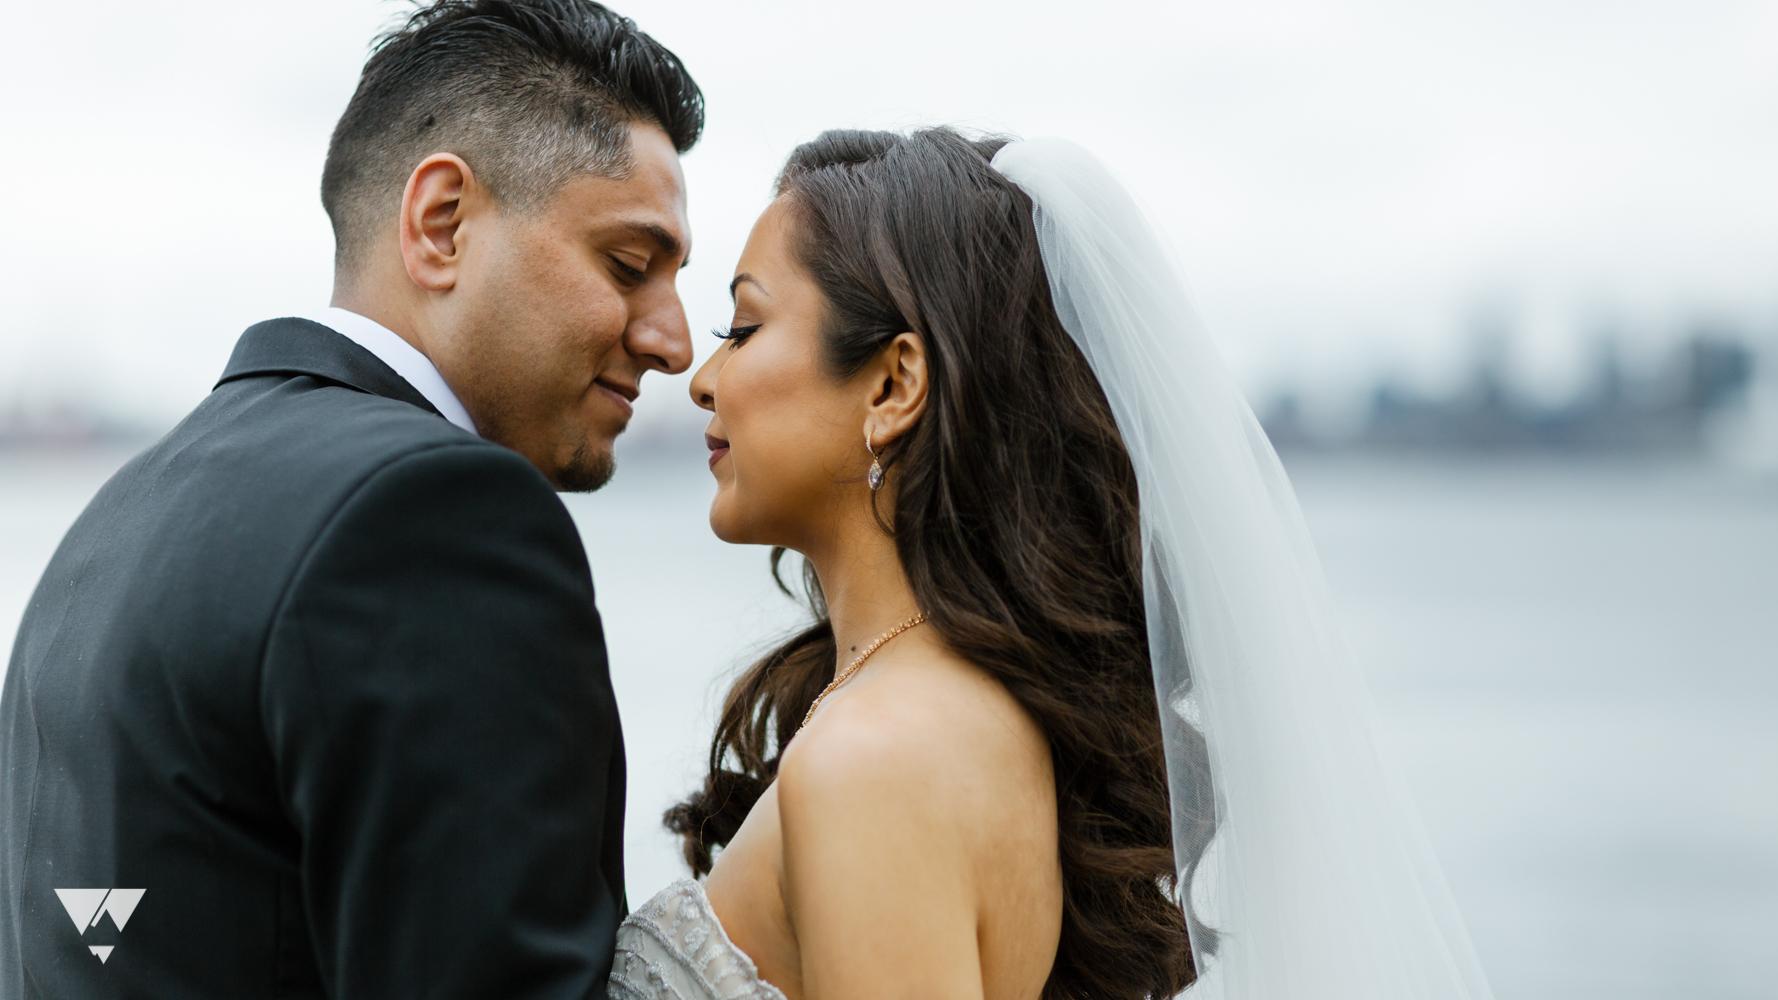 herafilms_wedding_trina_andy_hera_selects_web-27.jpg